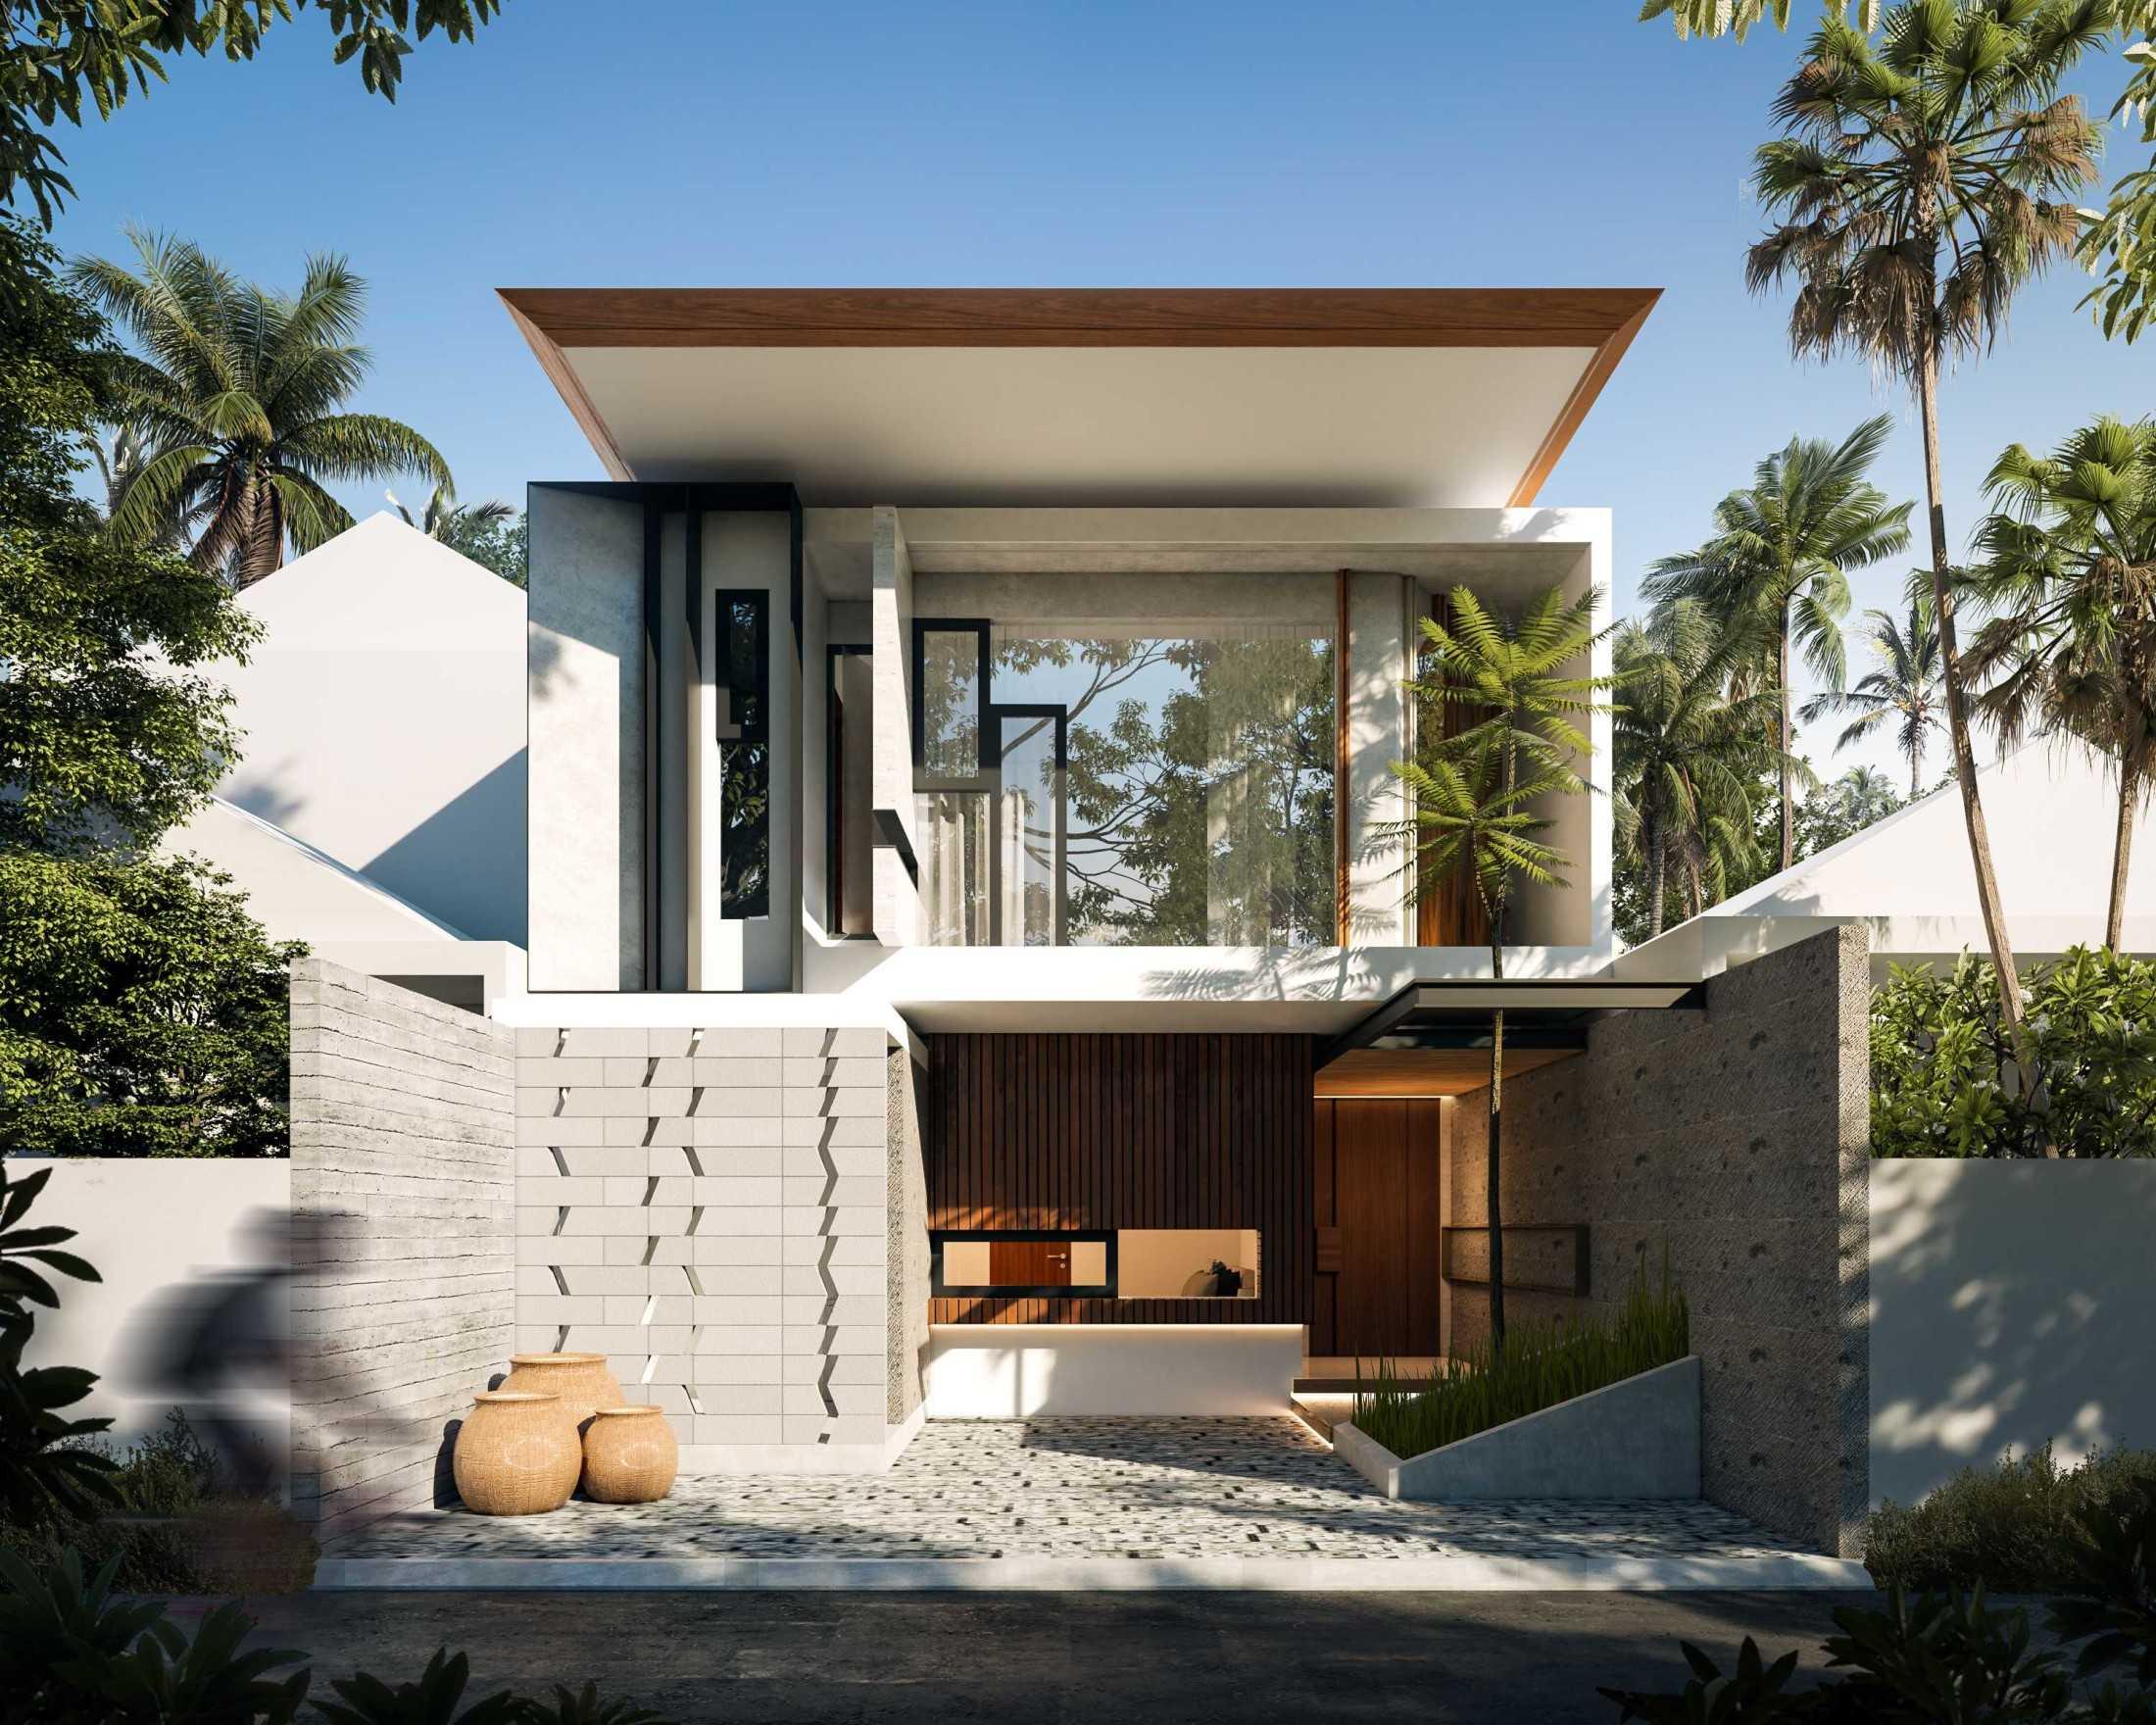 Studio Lumbung Architects Villa D&k Sanur, Kec. Denpasar Sel., Kota Denpasar, Bali, Indonesia Sanur, Kec. Denpasar Sel., Kota Denpasar, Bali, Indonesia Studio-Lumbung-Architects-Villa-Dk  78884